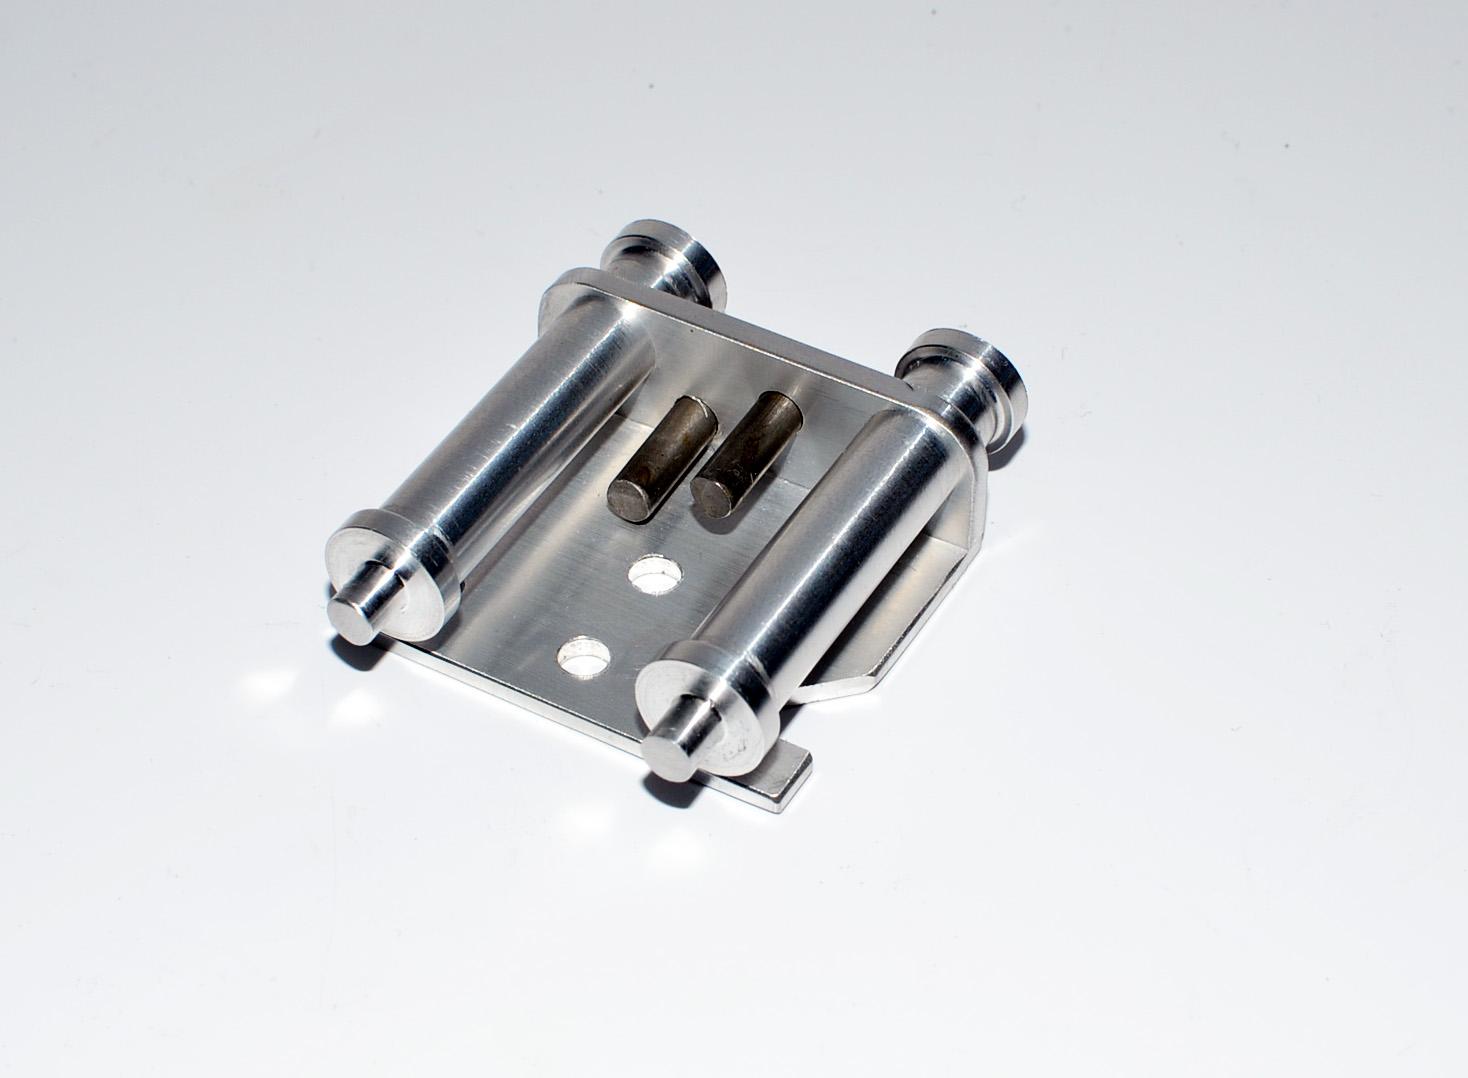 E11D - E22 POWERCYLINDERS